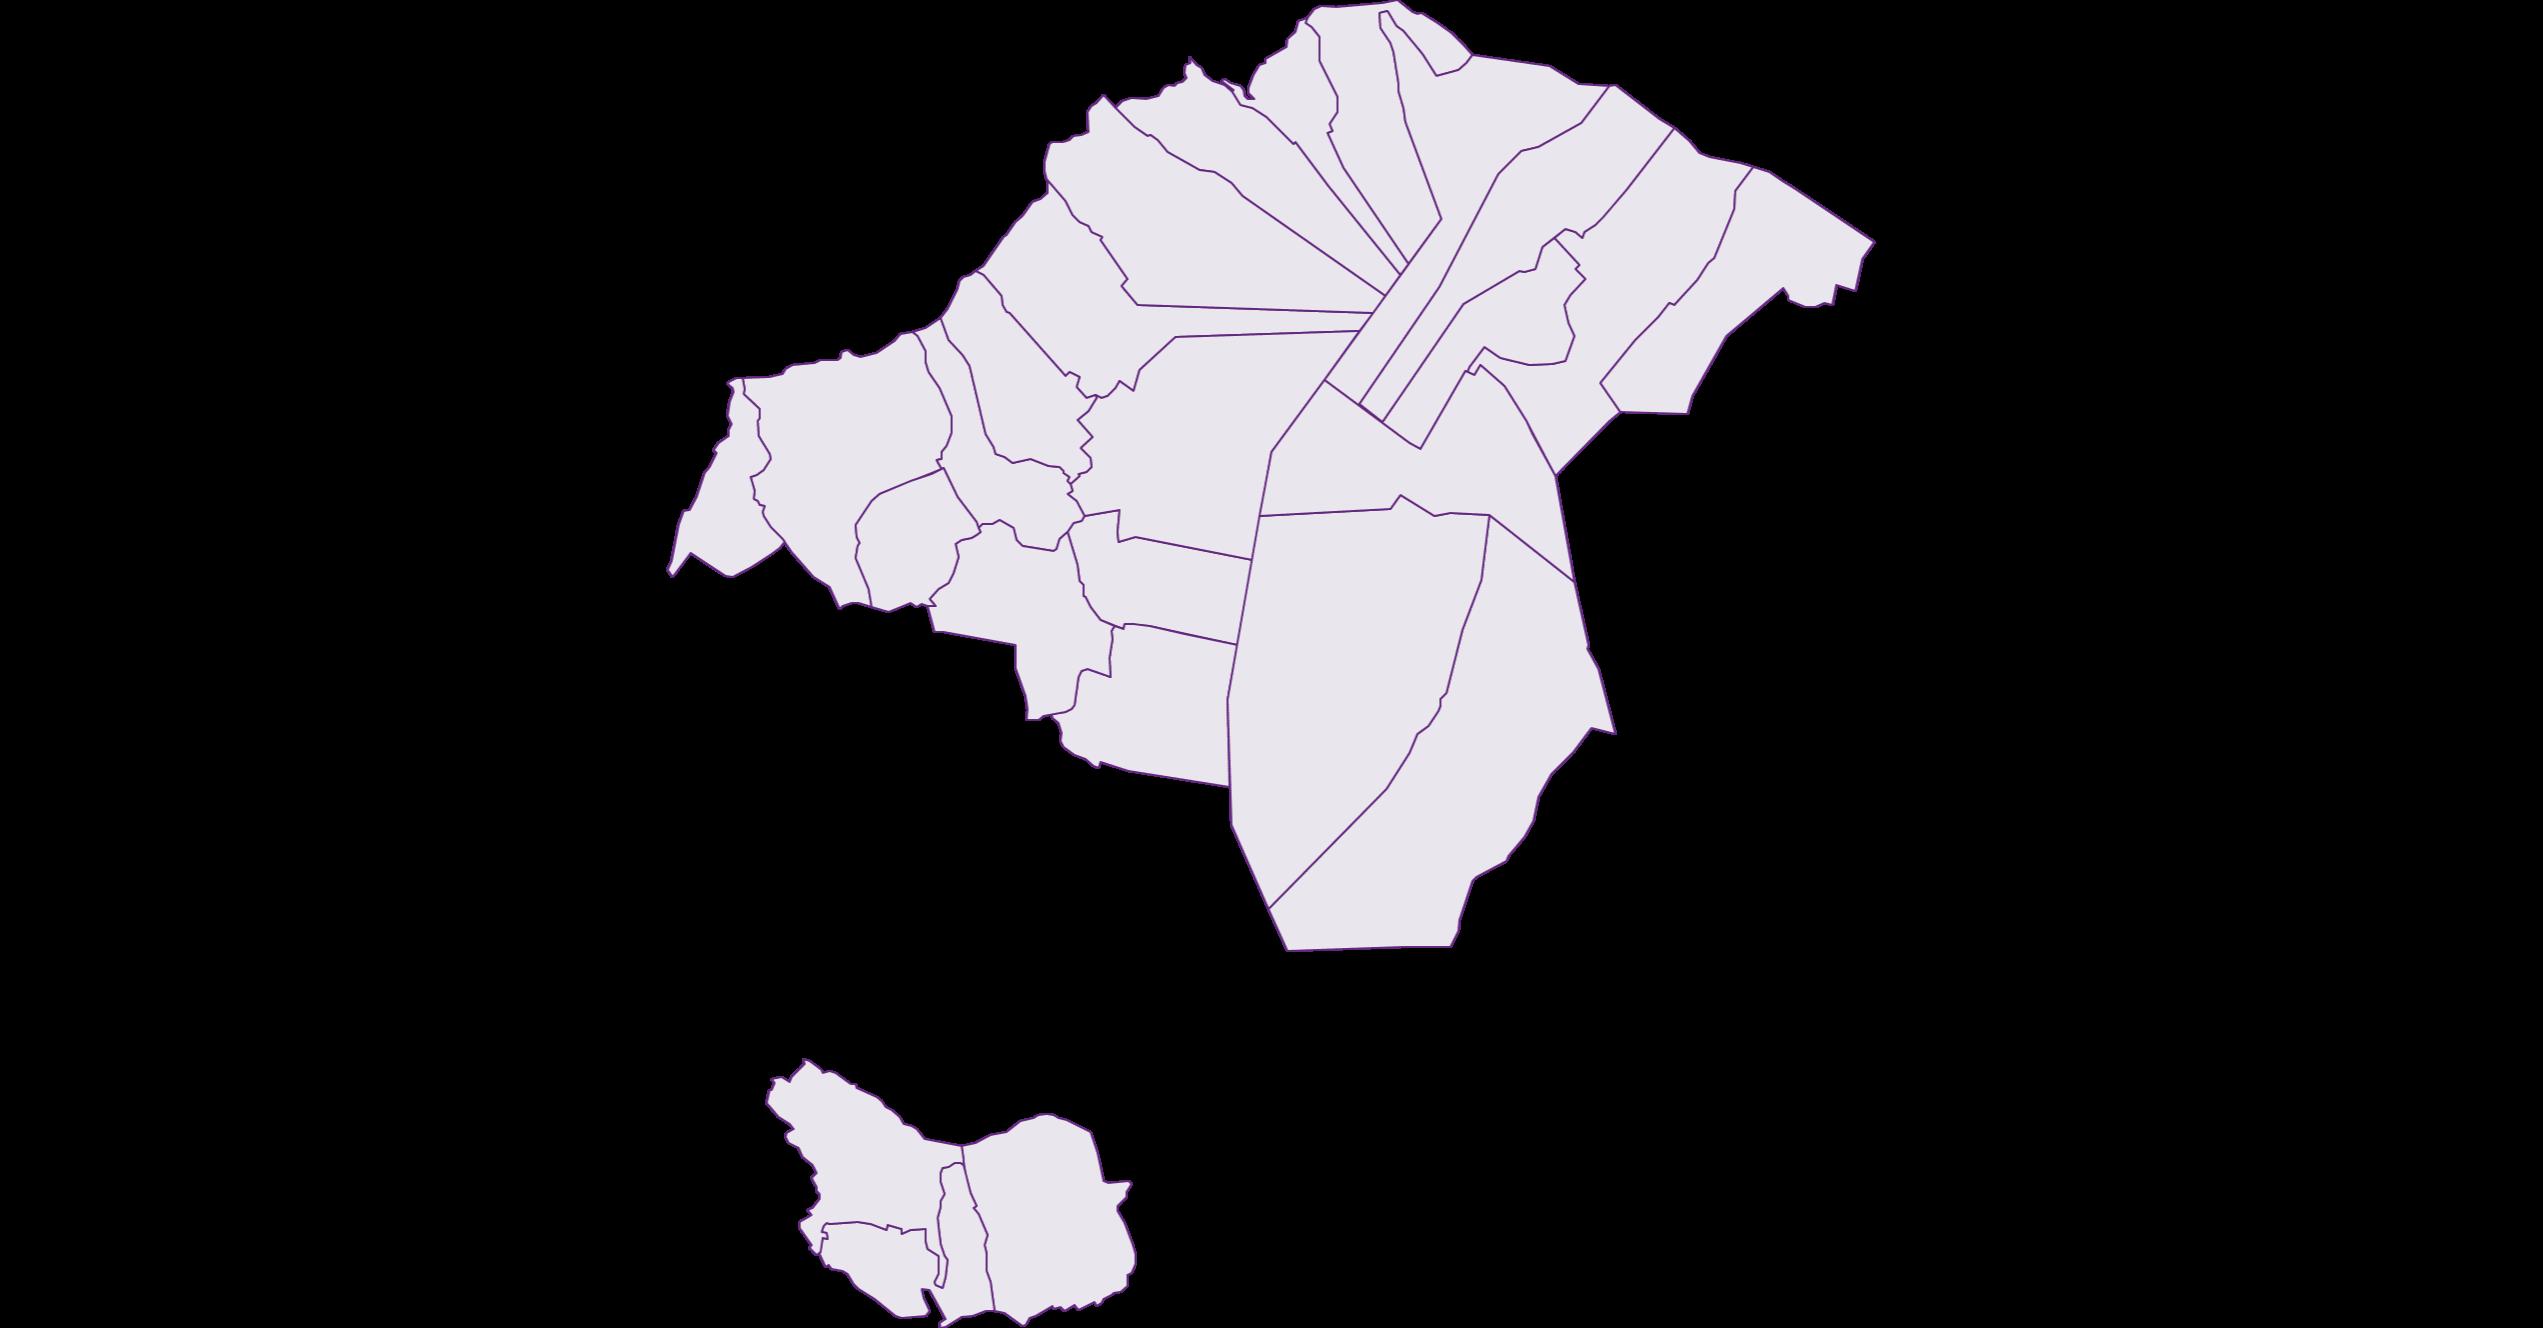 Lake Neusiedl wine growing region